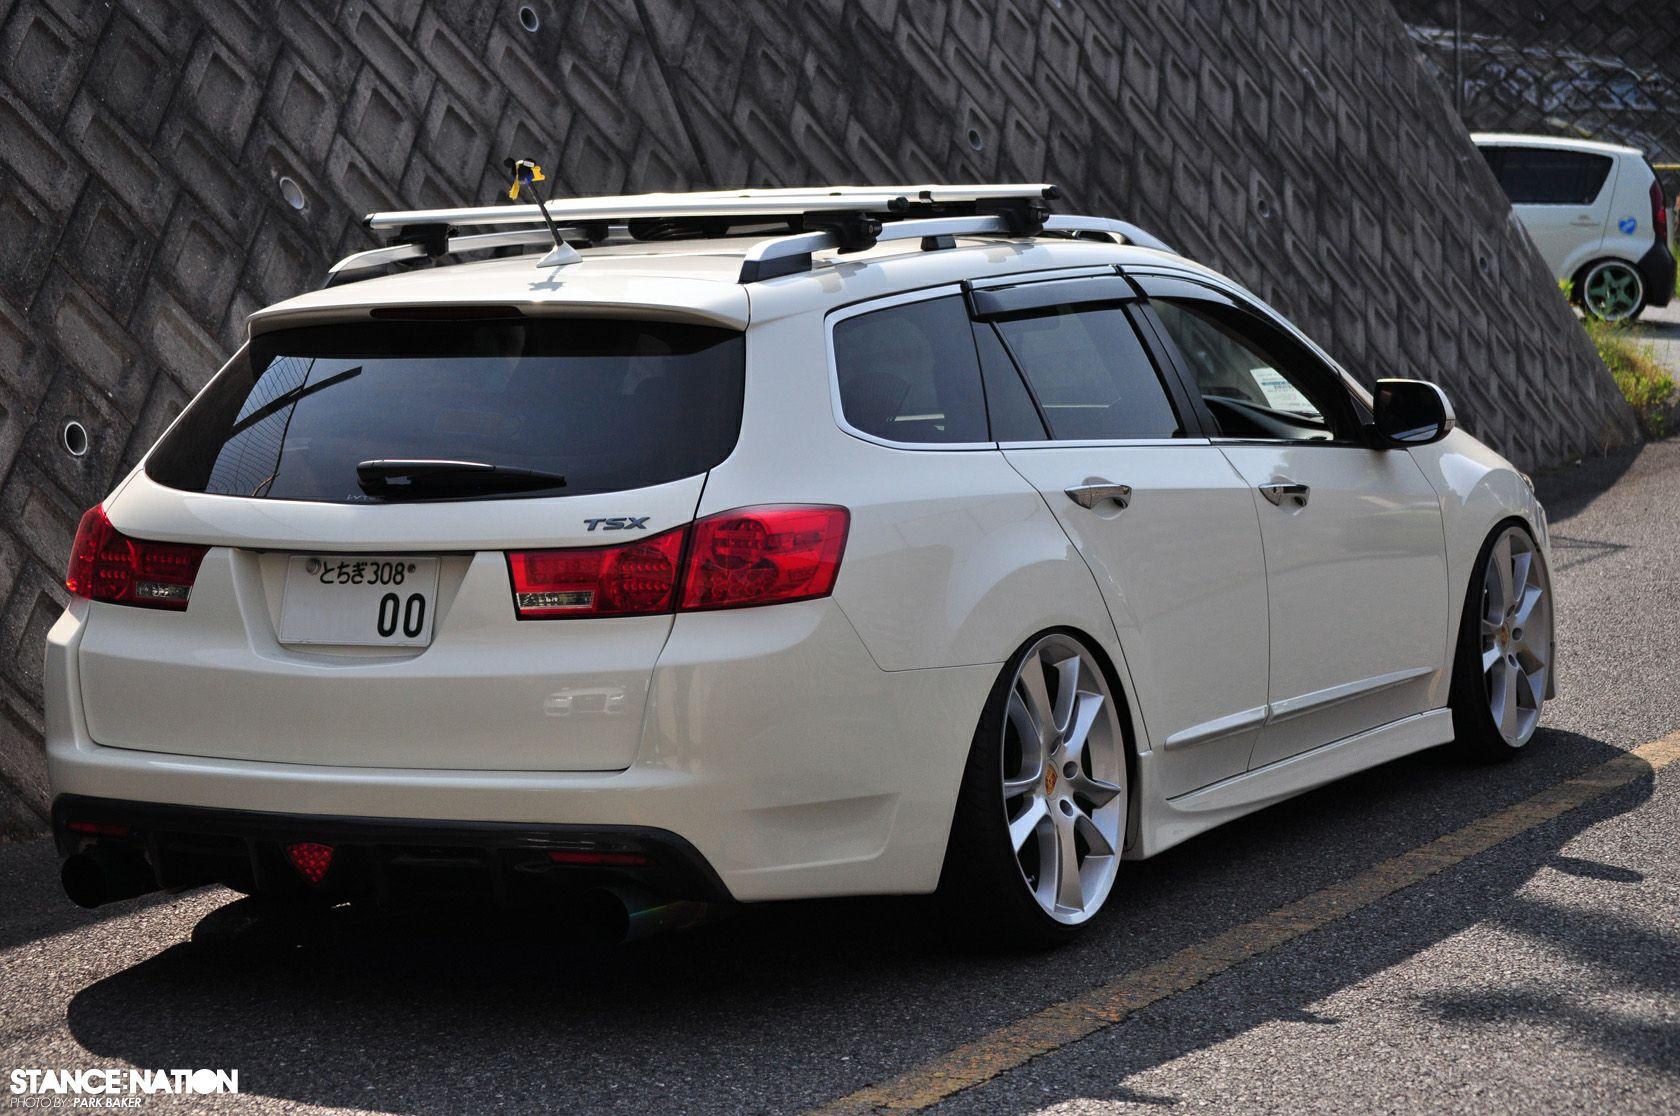 Acura tsx wagon hellaflush japan 2012 i love wagons and this one